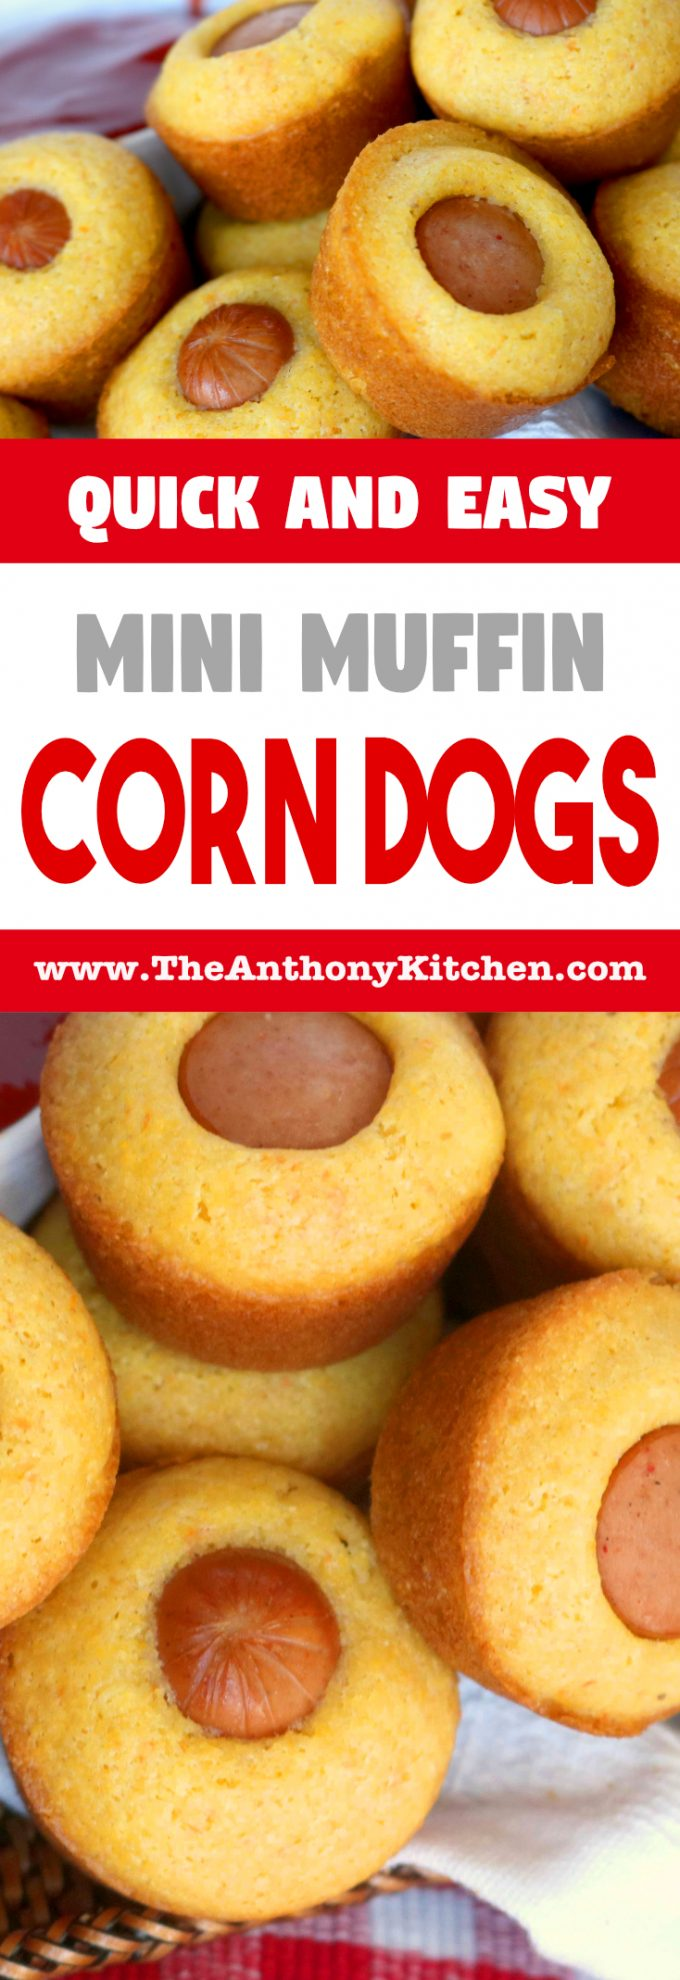 MINI MUFFIN CORN DOGS